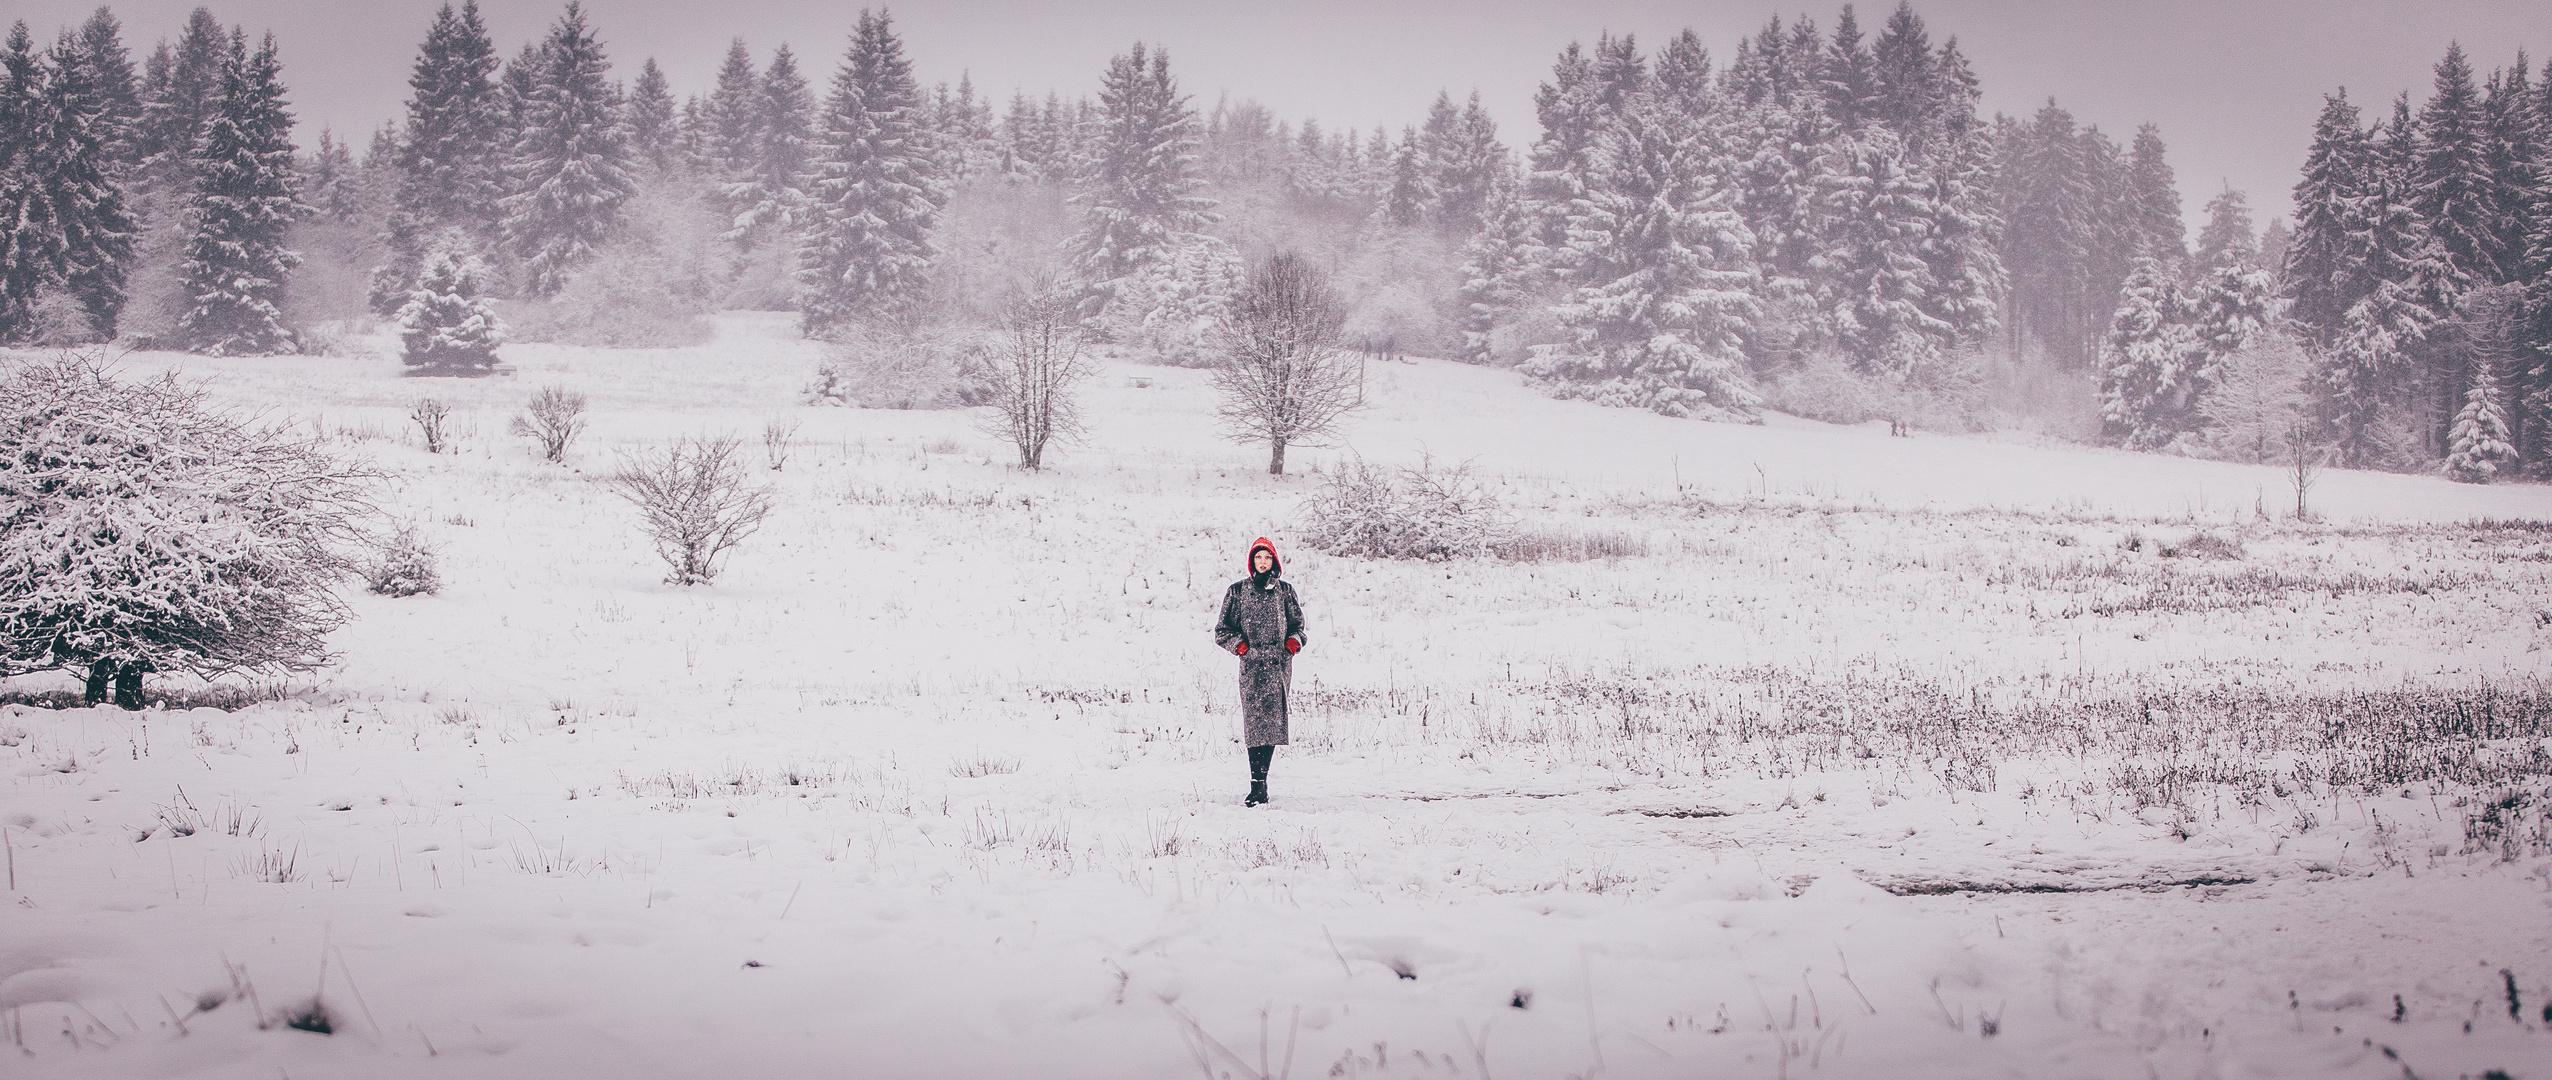 Let it snow, let it snow, let it snow.